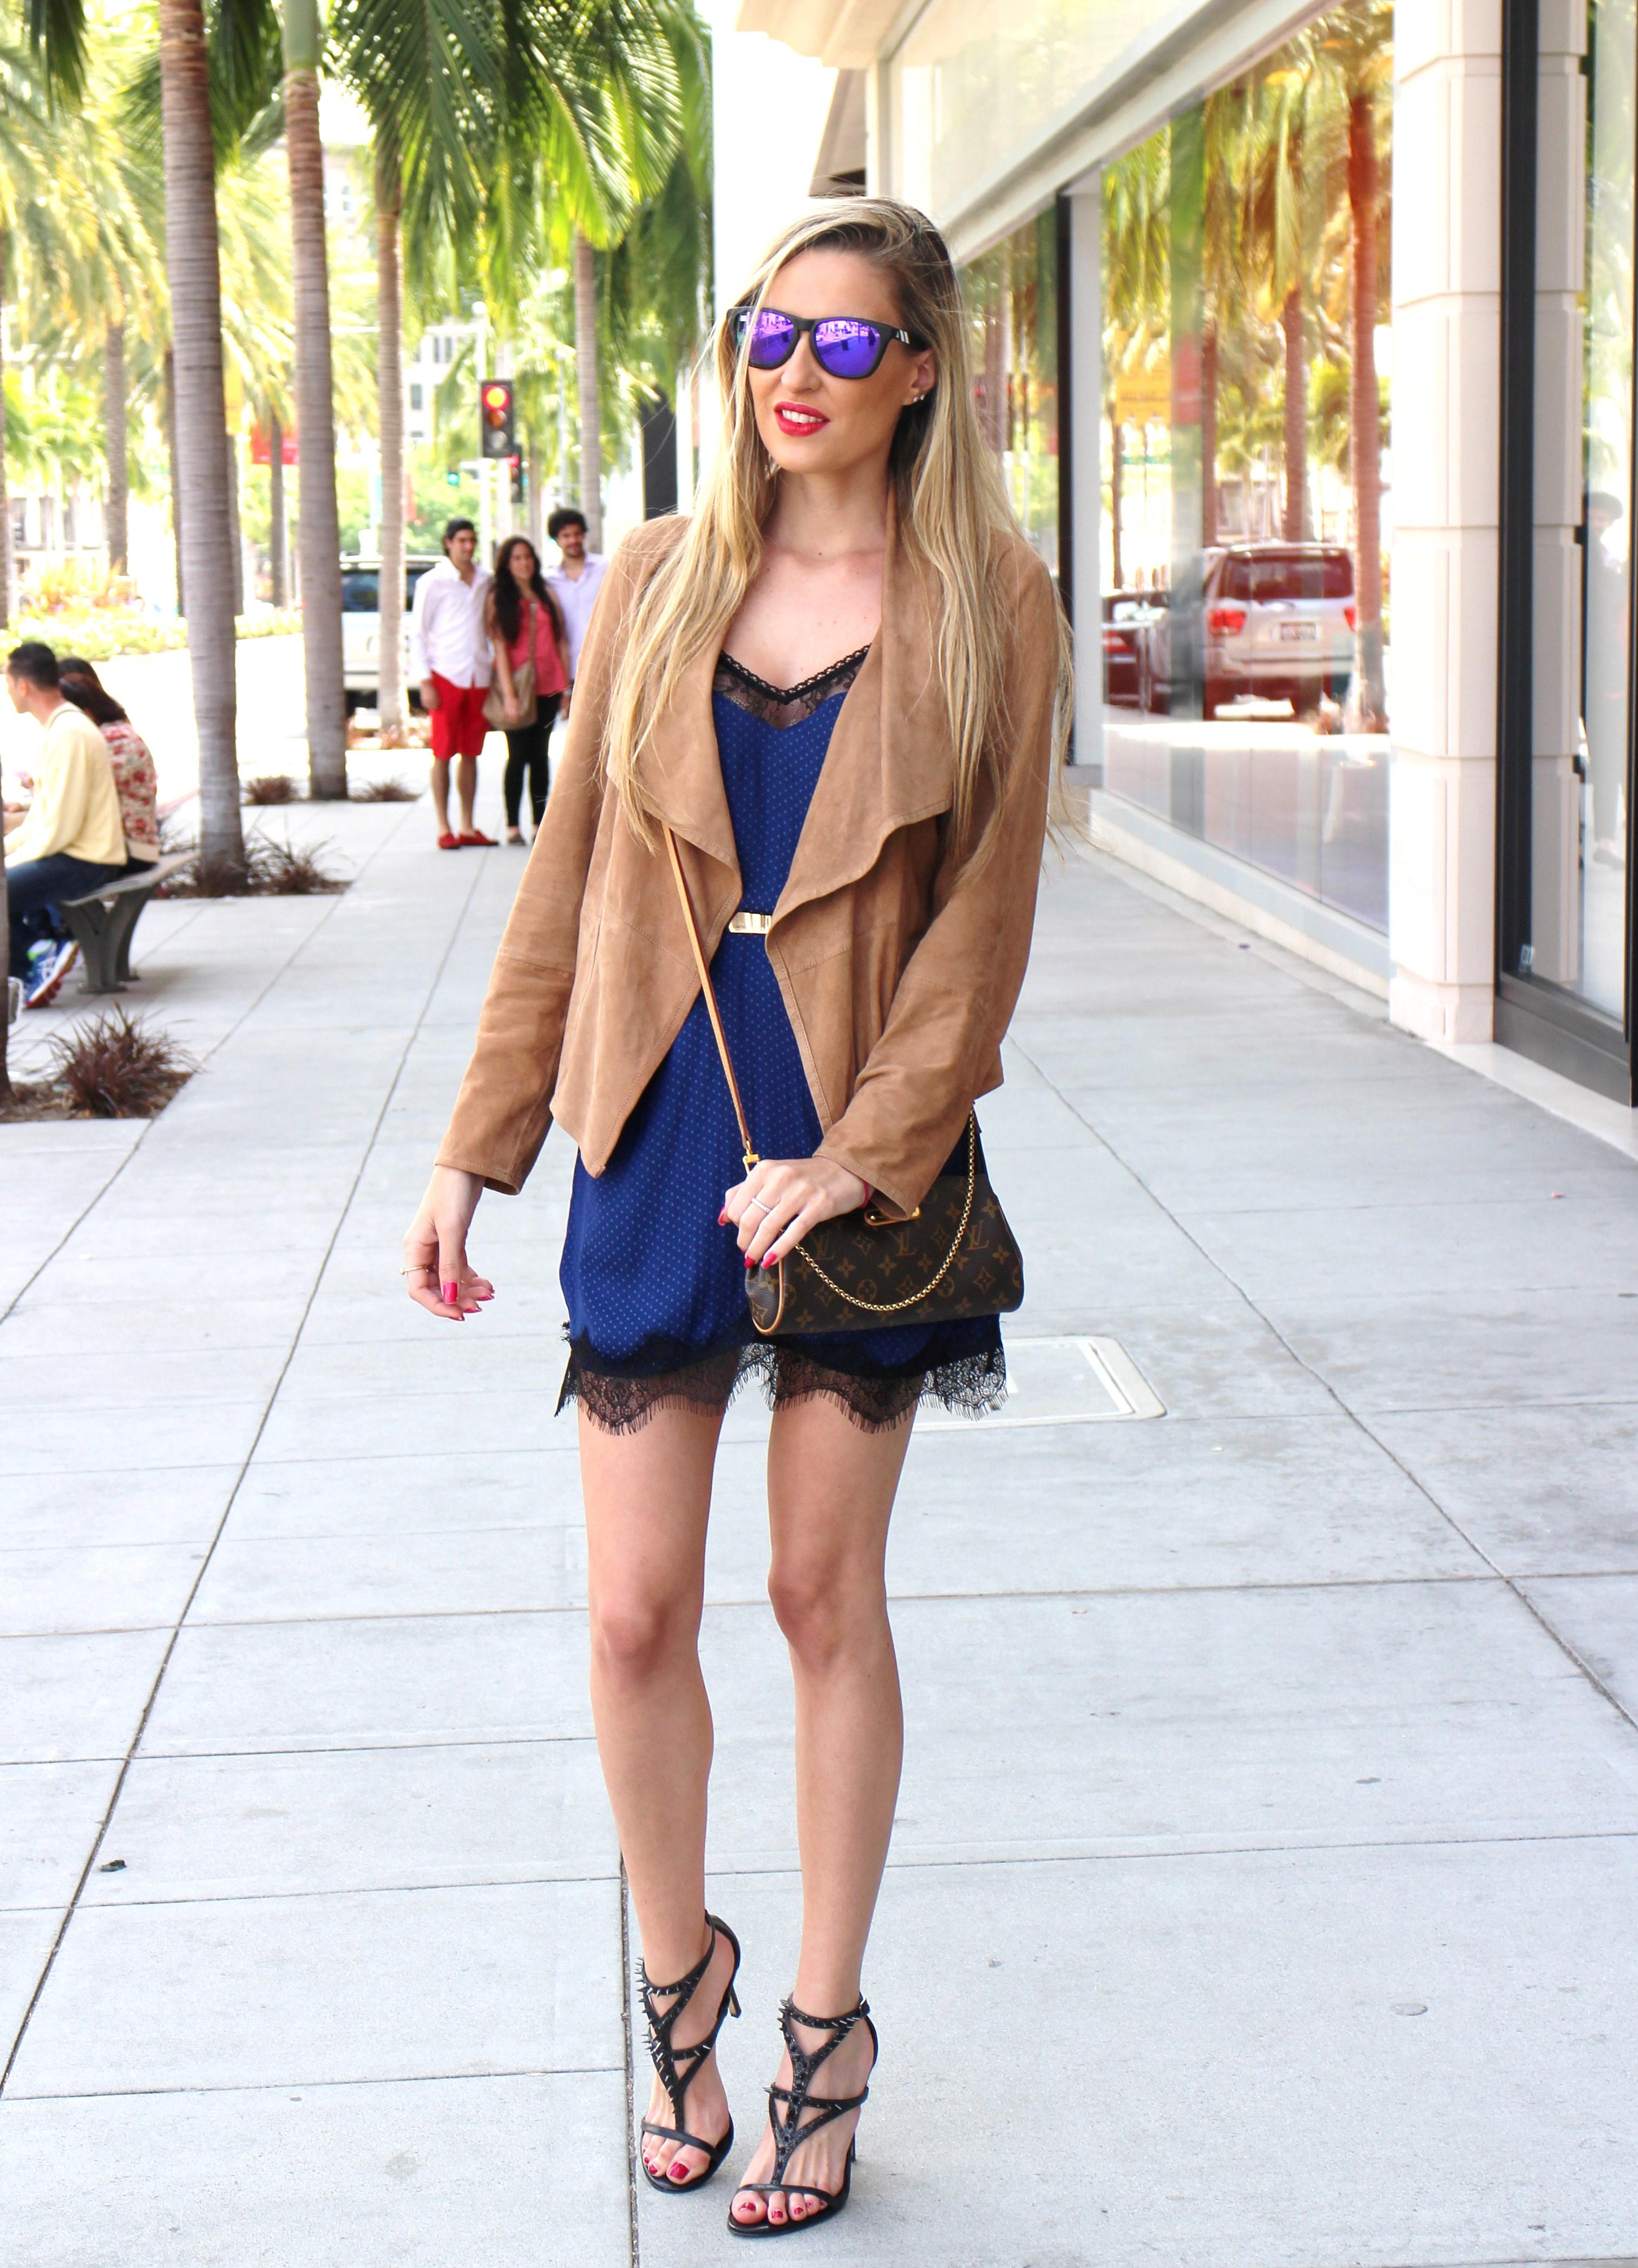 Rodeo_Drive_Los_Angeles_California_Shopping_Lara_Martin_Gilarranz_Bymyheels (1)